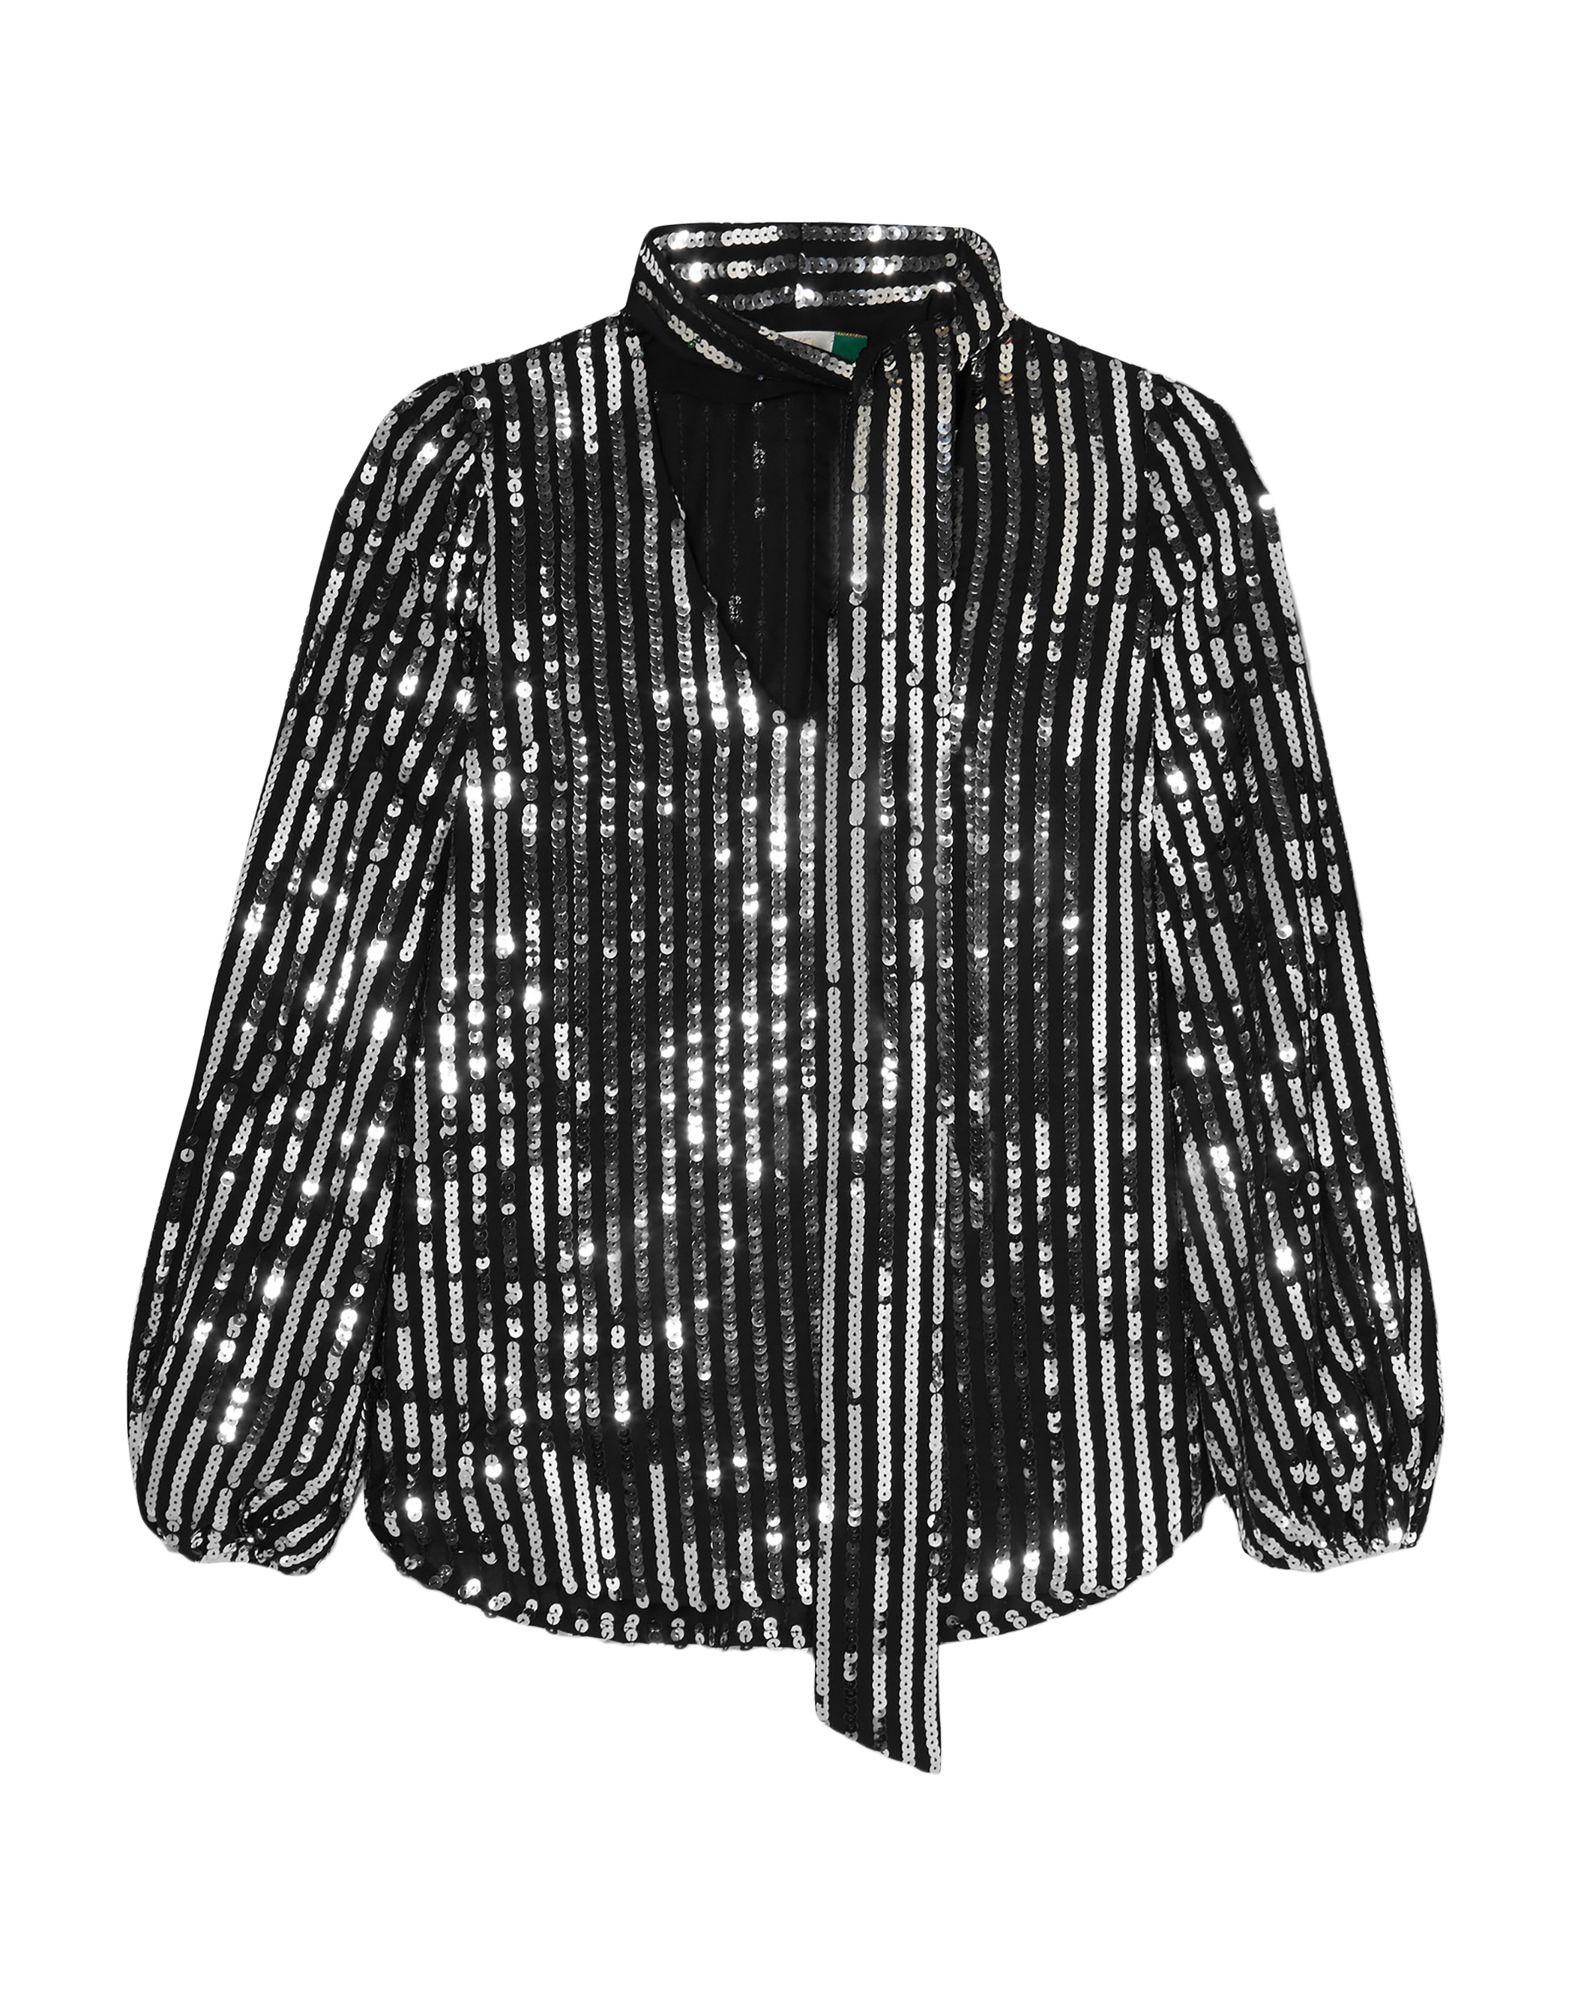 RIXO Блузка блузка quelle linea tesini by heine 6300